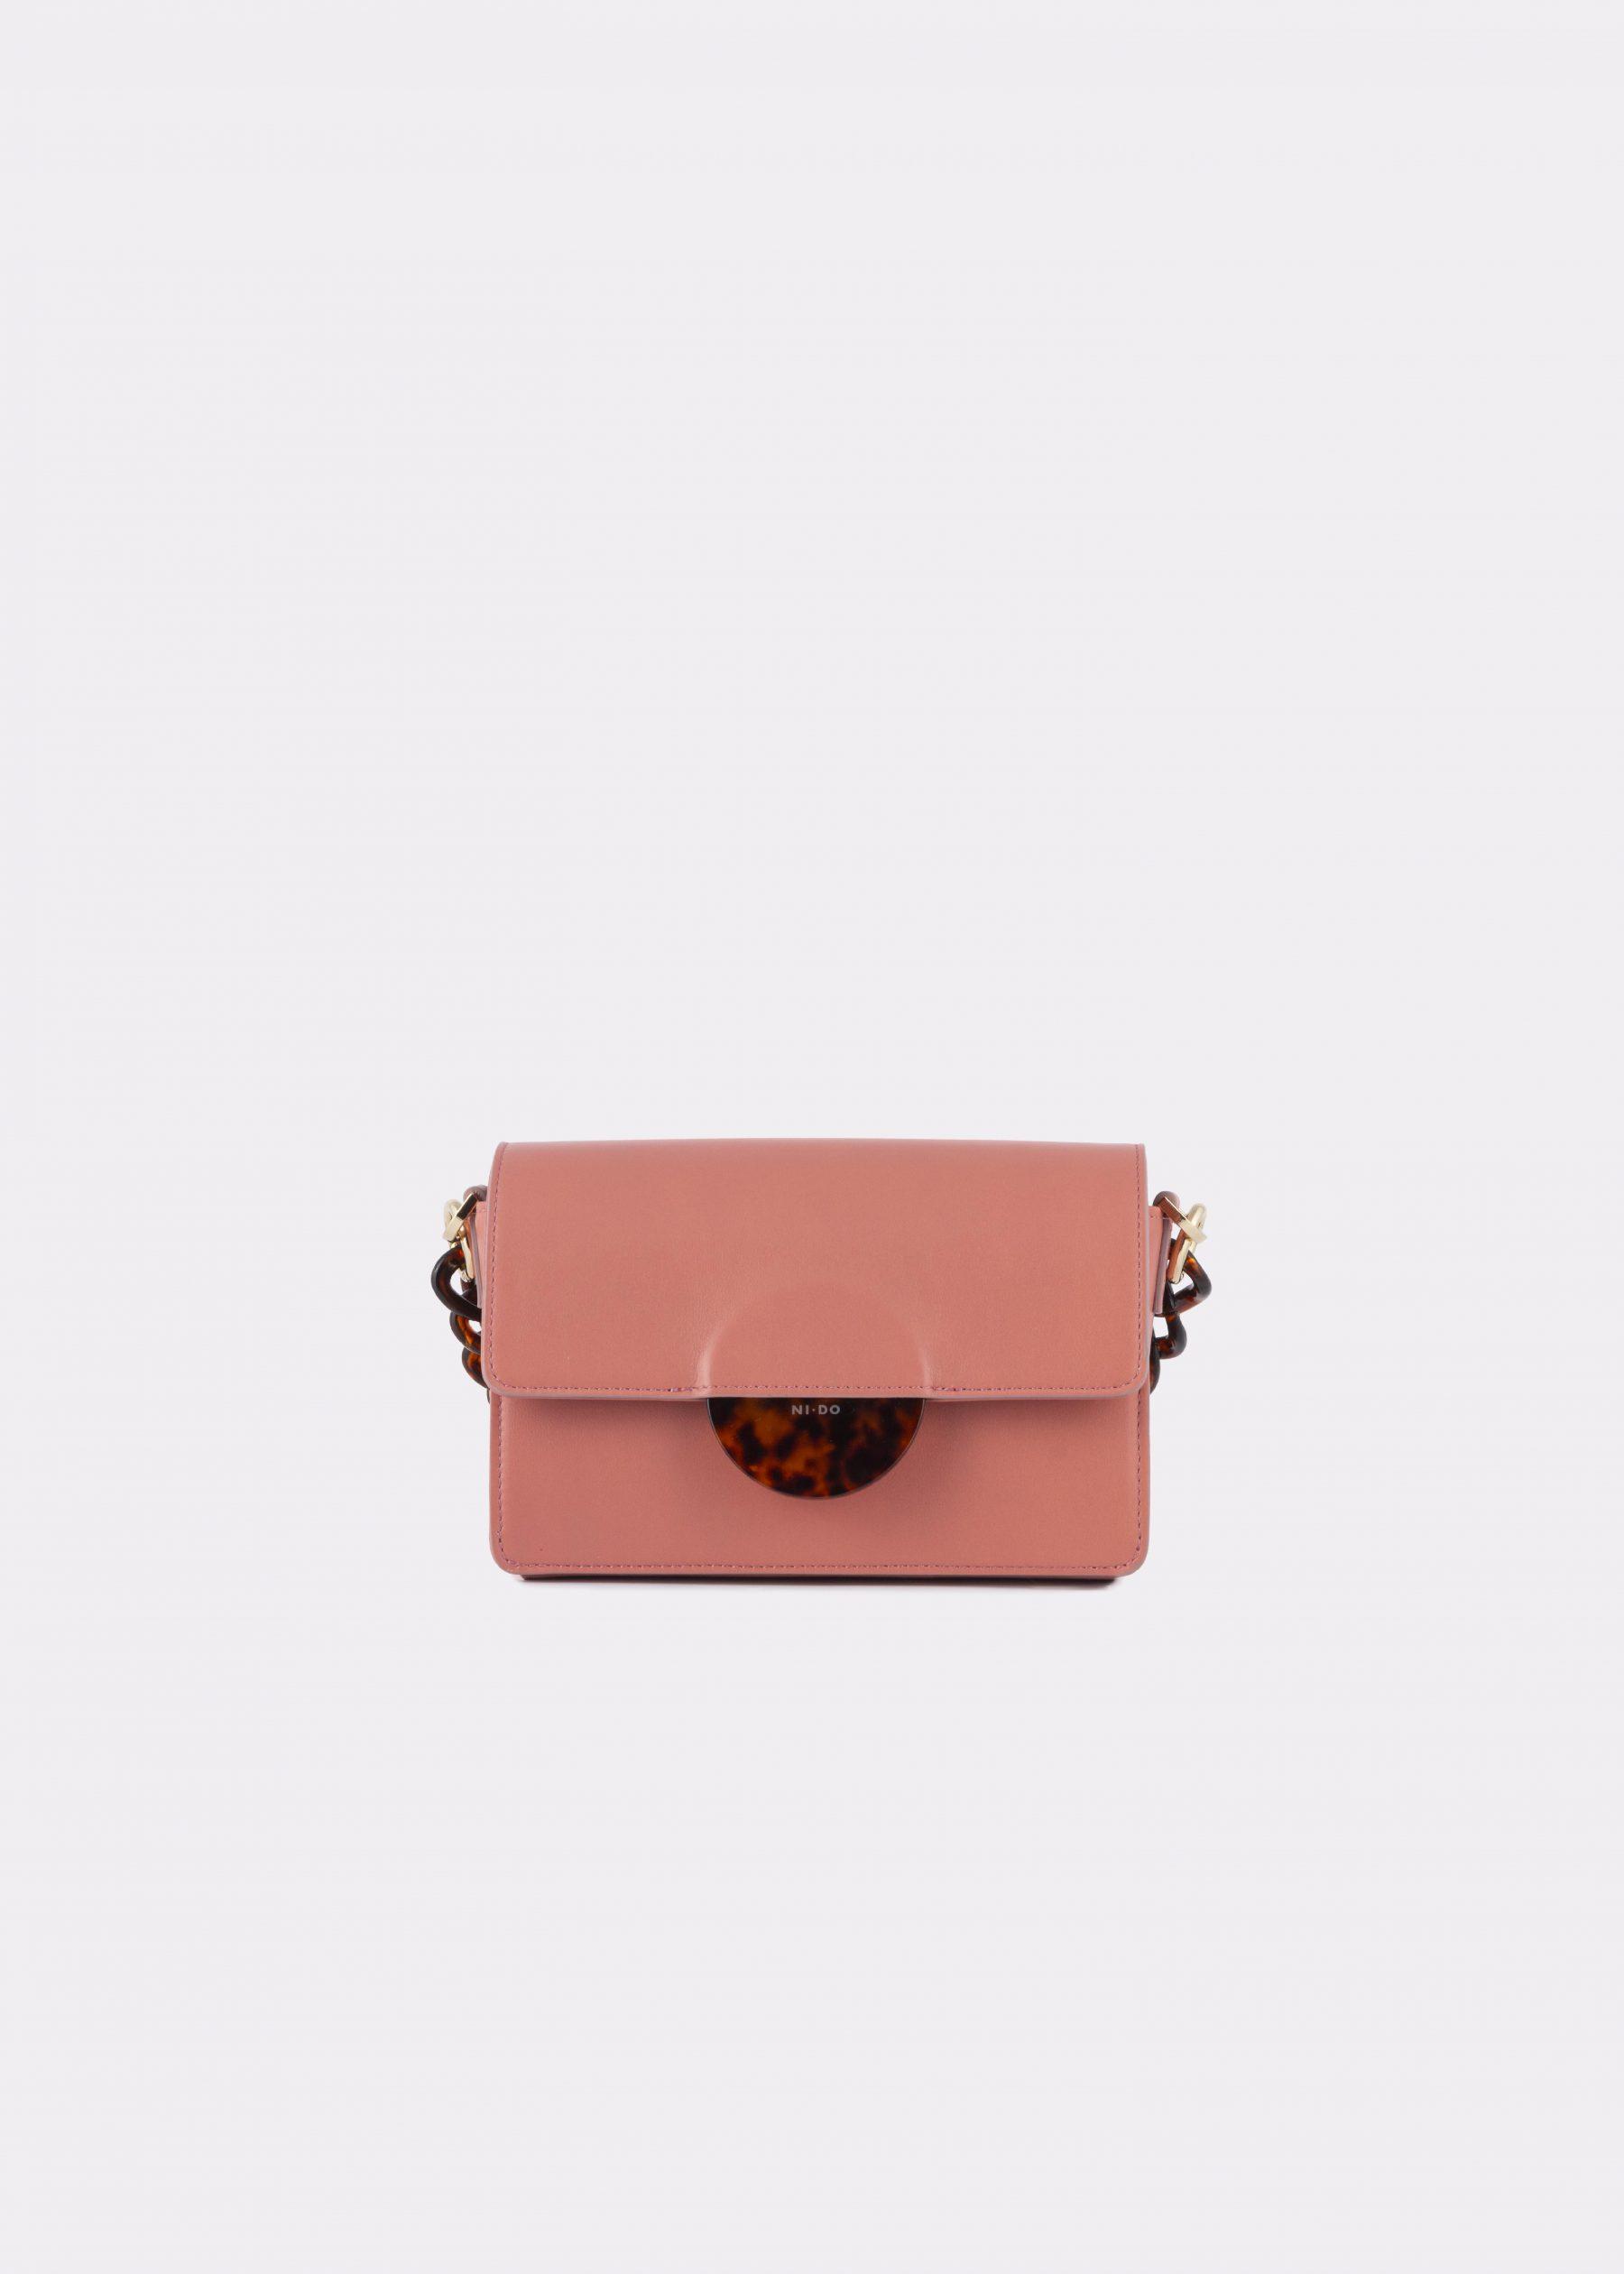 NIDO Cuore Mini bag Blush front view